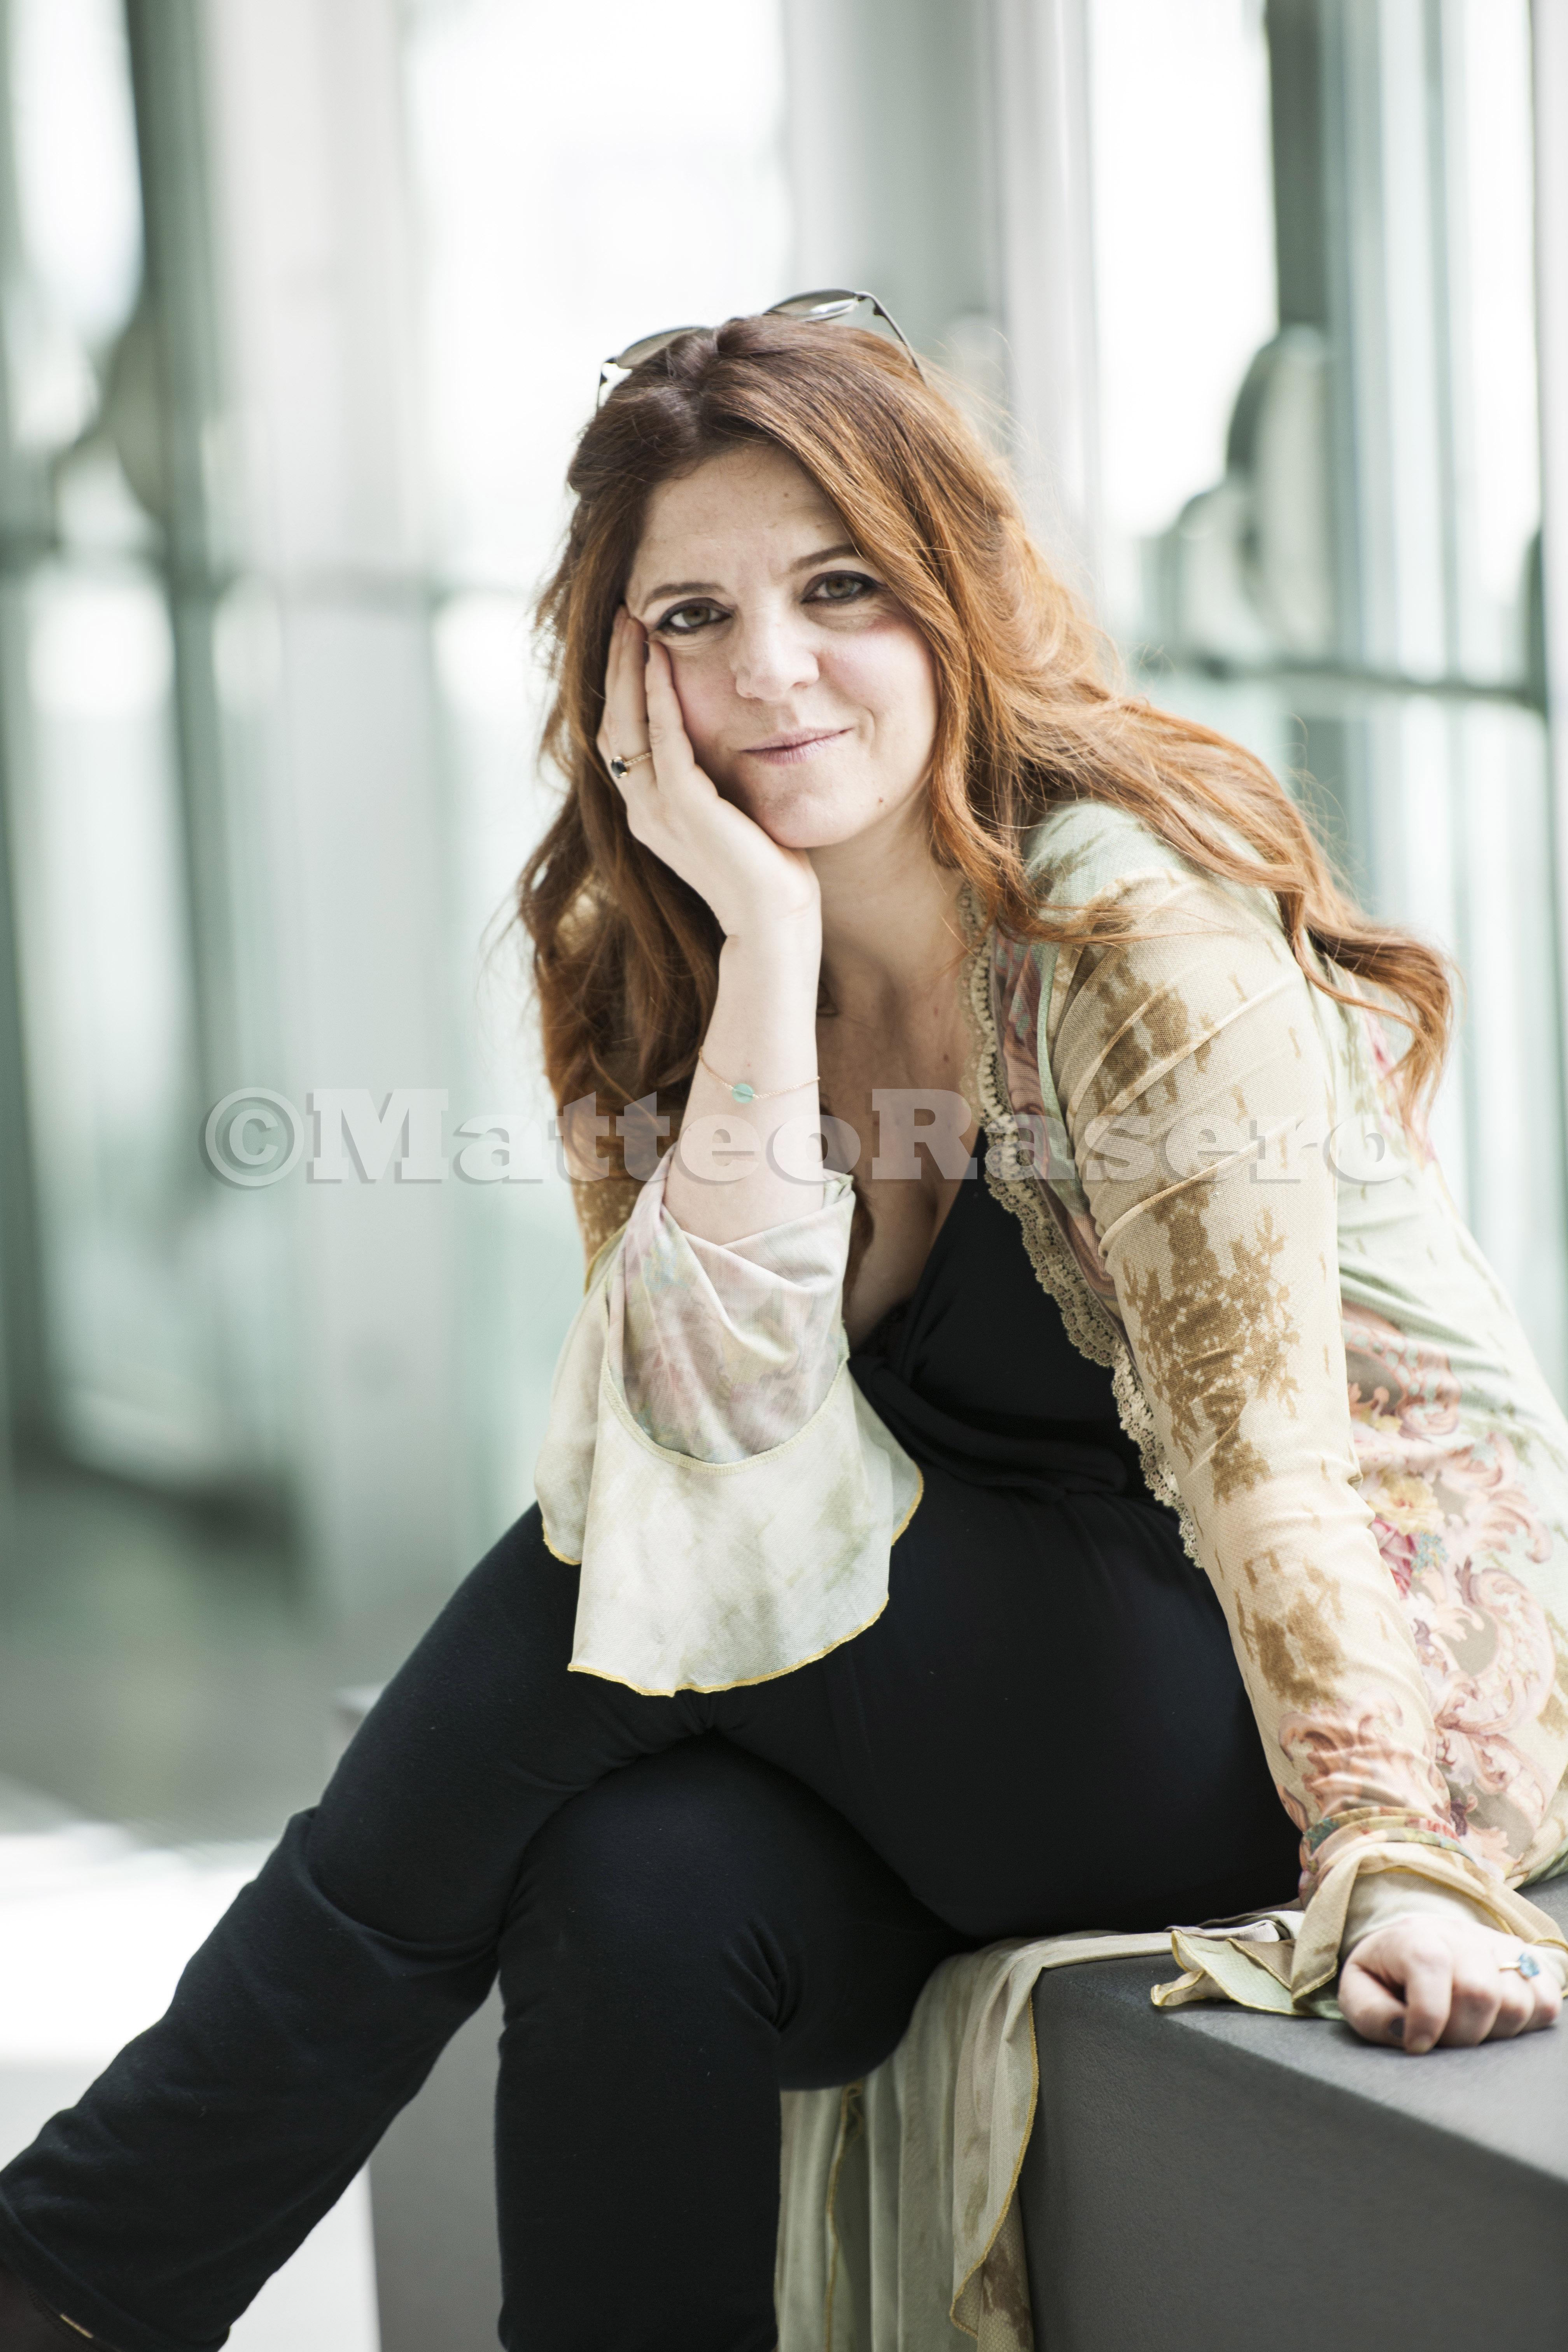 Agnes Jaoui, 2013